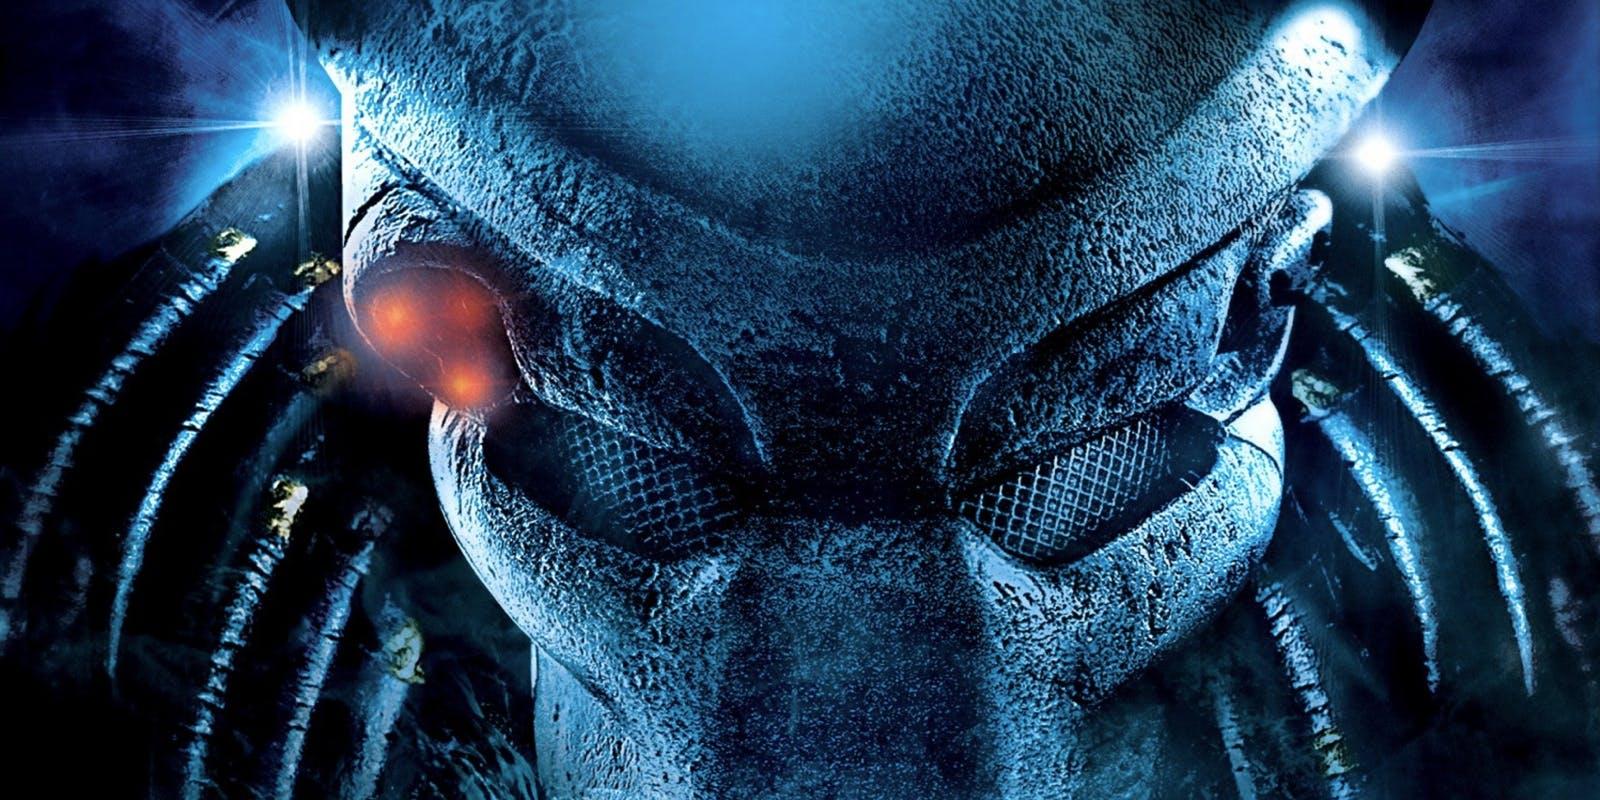 A Fox újra nekifut, jön az új Predator mozi